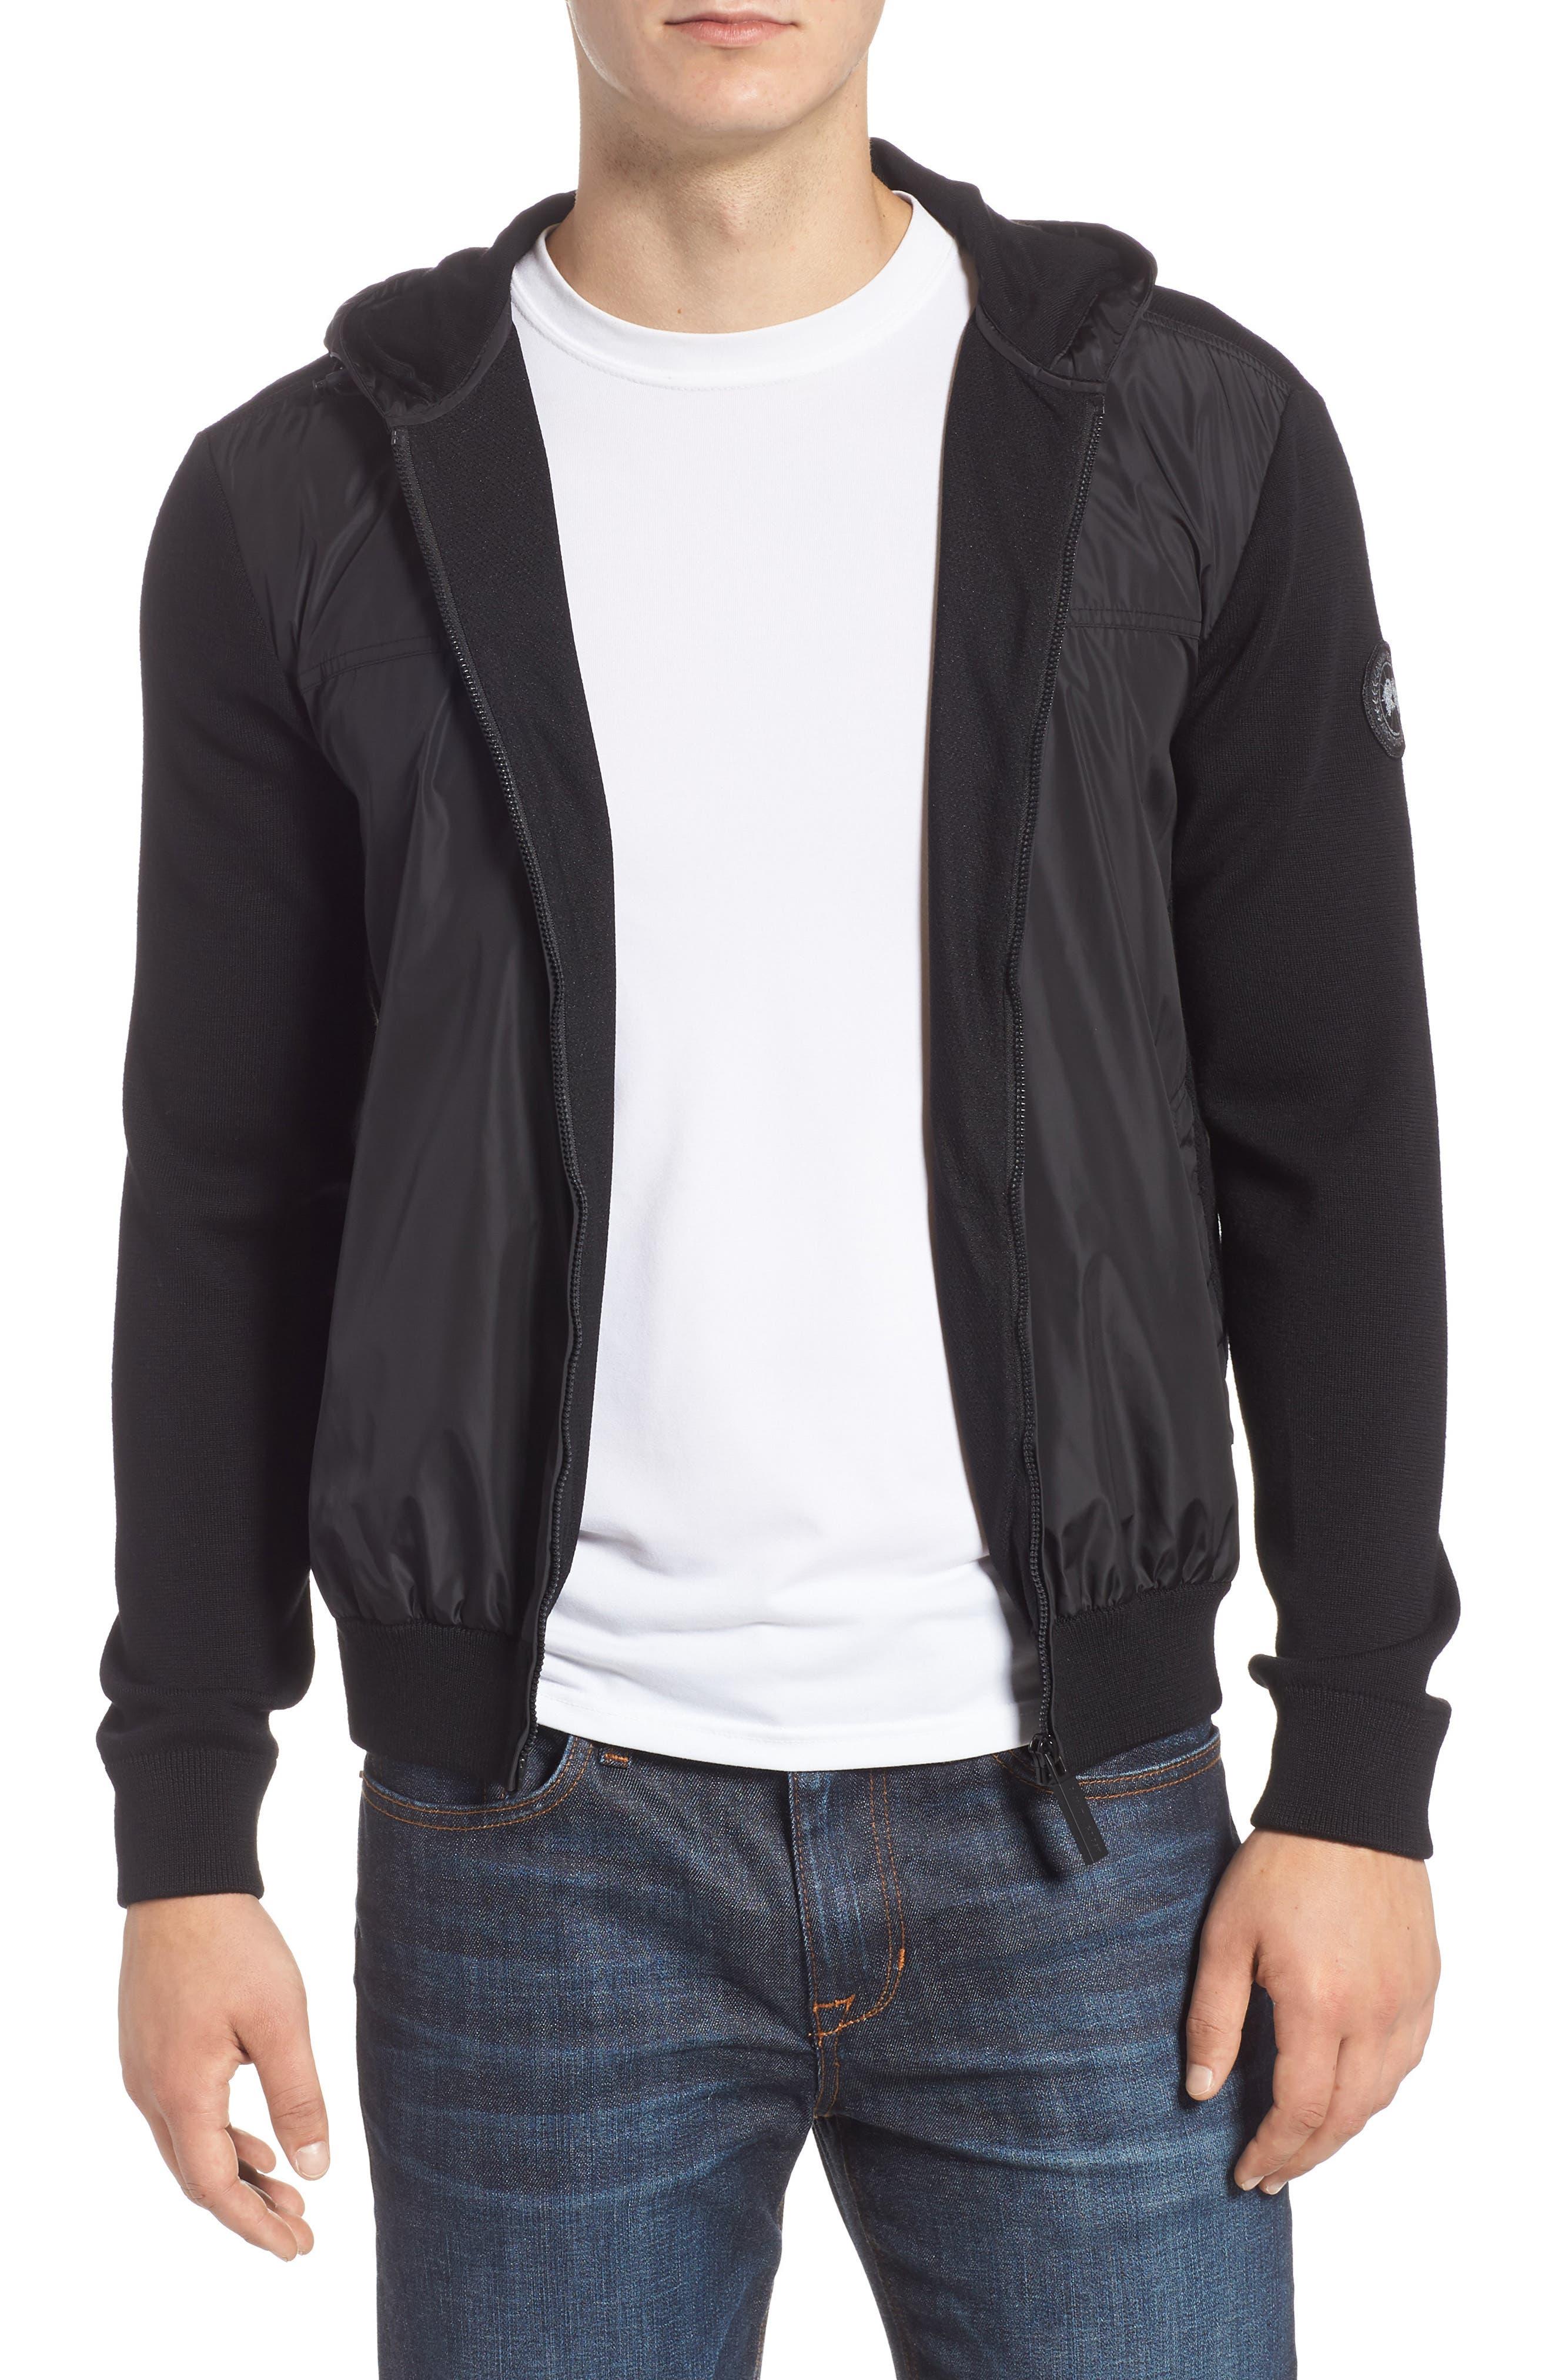 Windbridge Regular Fit Hooded Sweater Jacket,                         Main,                         color, BLACK